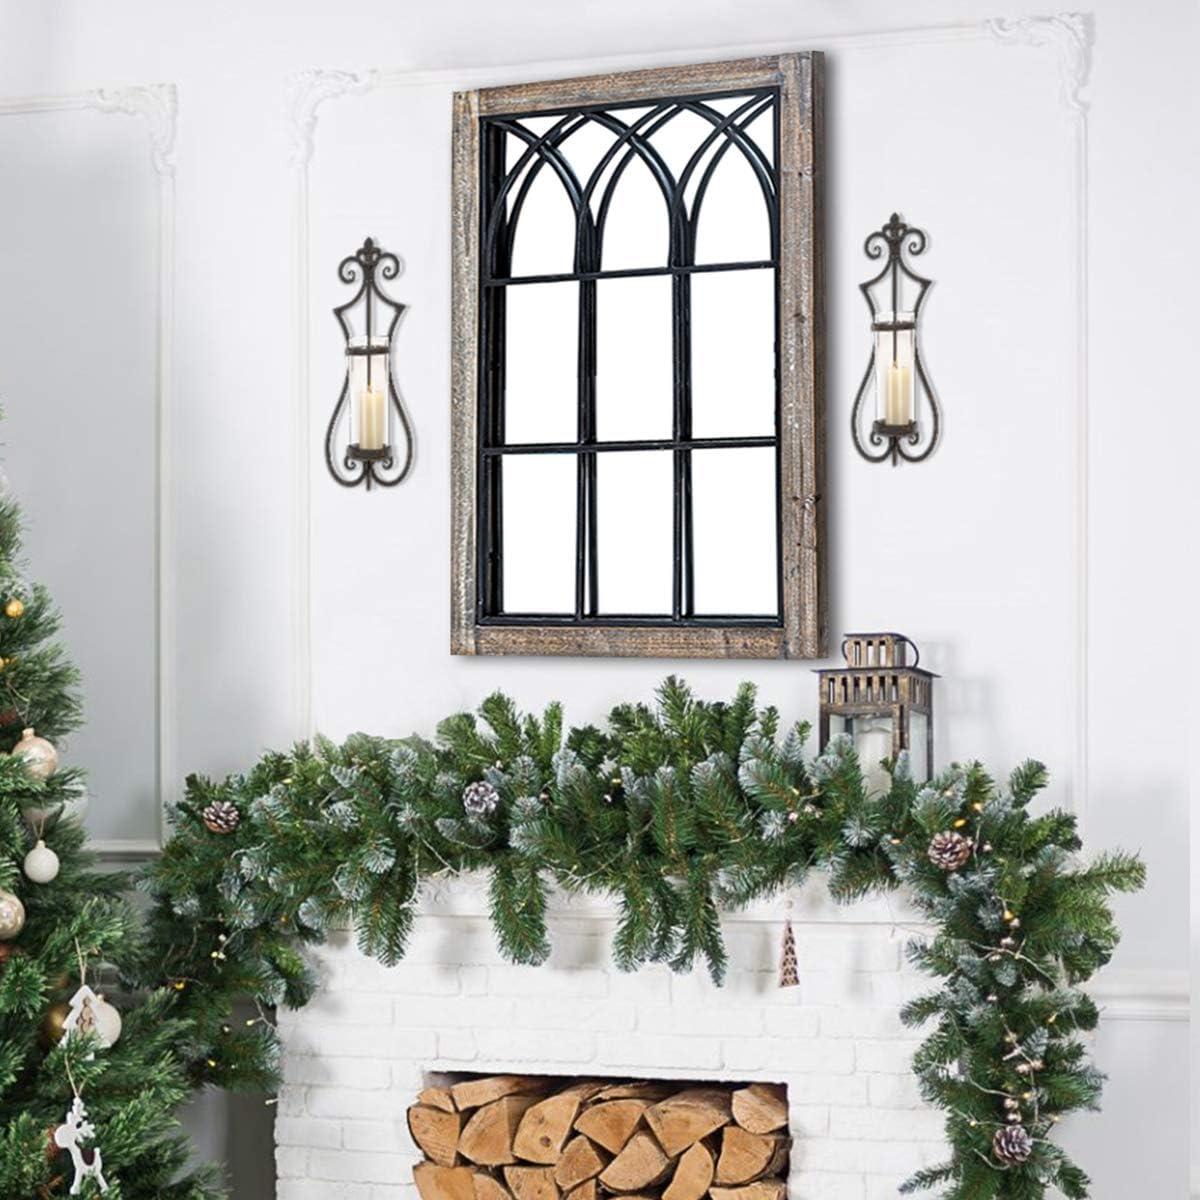 "HAWOO Farmhouse Mirror, Wood Windowpane Rustic Arch Mirror Wall Mirror, Window Mirrors for Wall Decor, 37.5"" H x 24"" W, Weathered Brown"